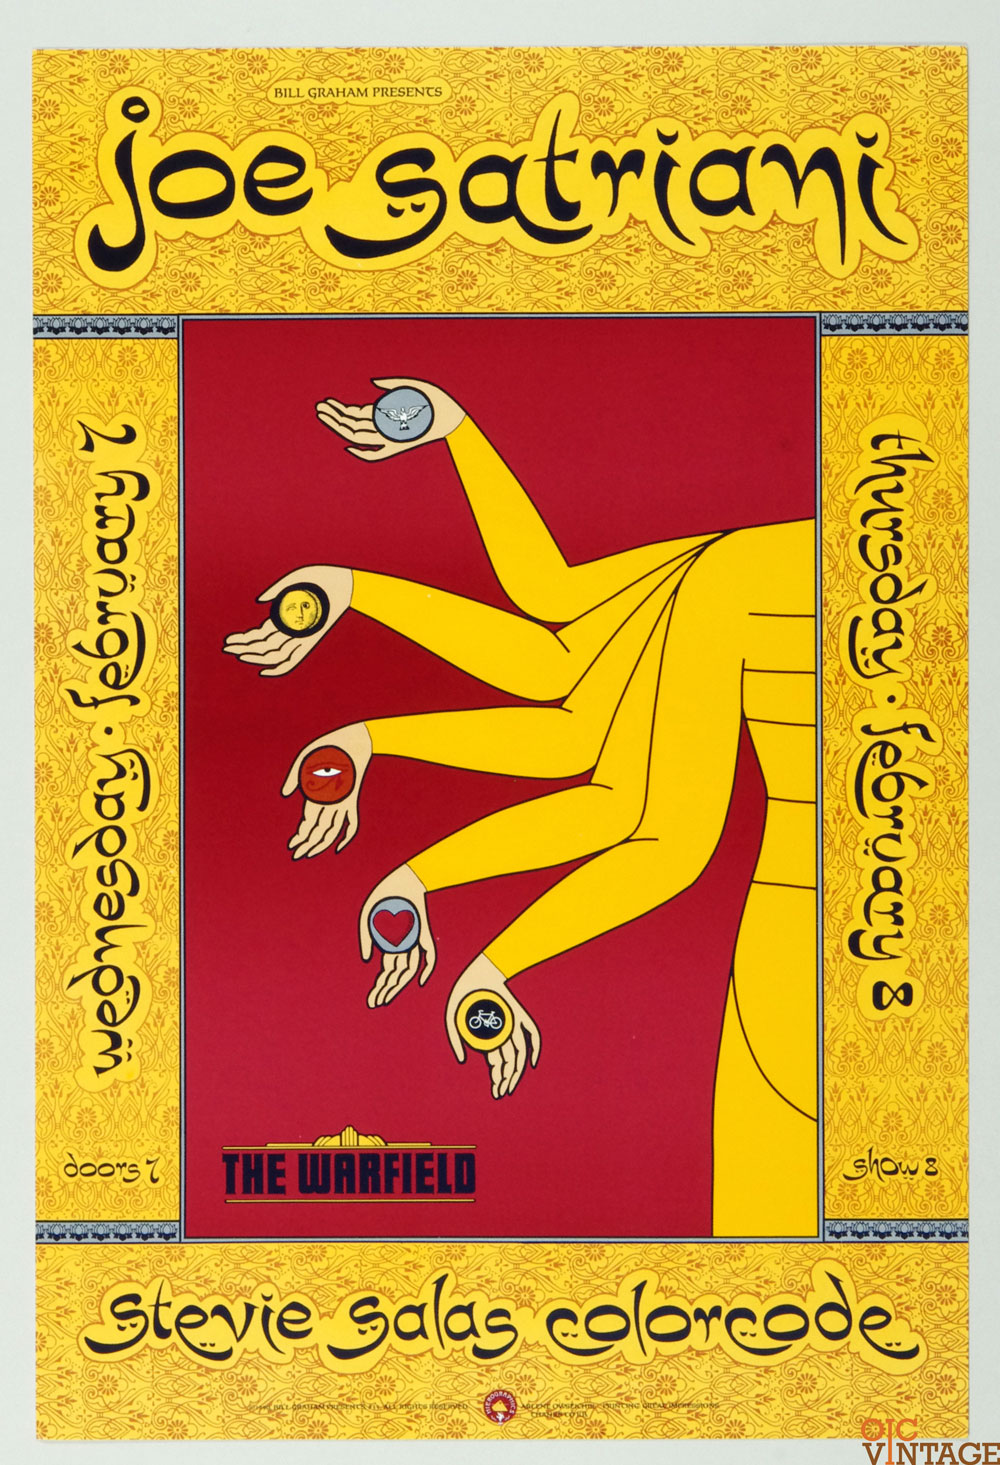 Bill Graham Presents Poster 1990 Feb 8 Joe Satriani #35